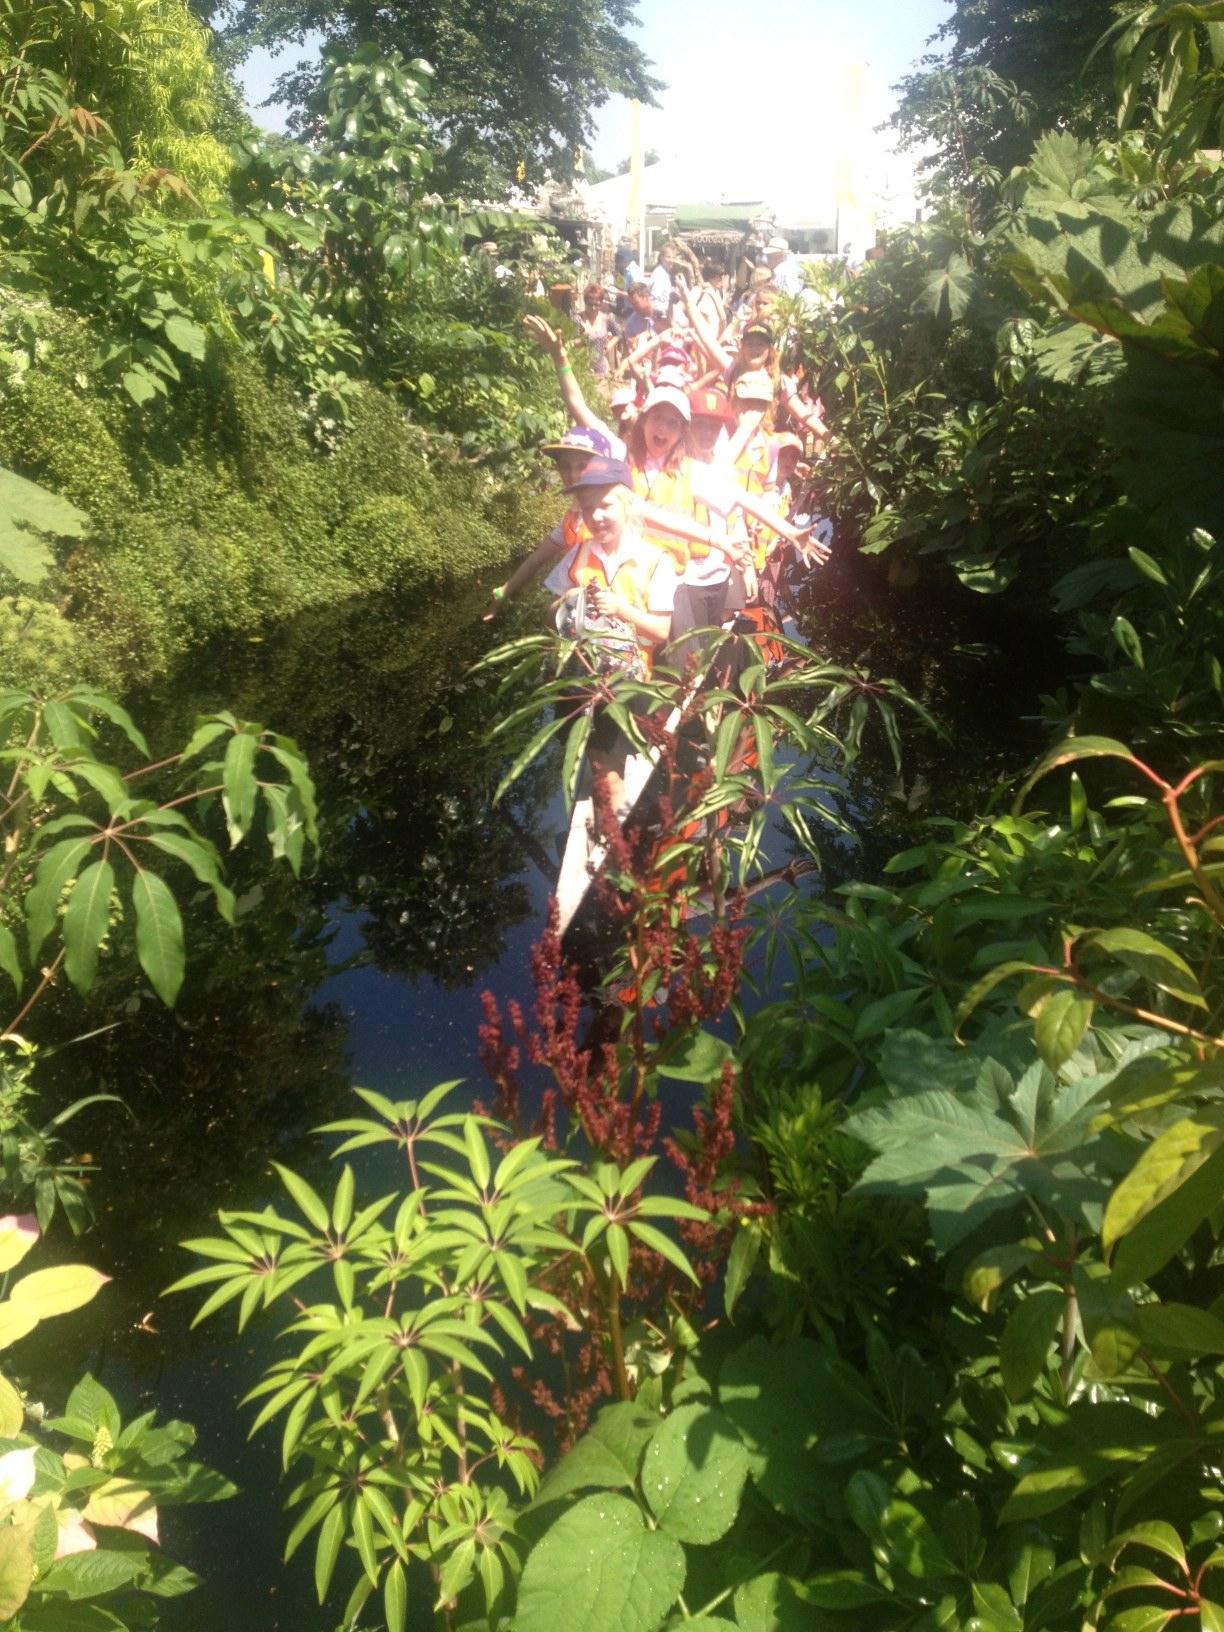 Press day at RHS Hampton Court Palace Flower Show / 2013 / Sophie Walker / A Valley Garden